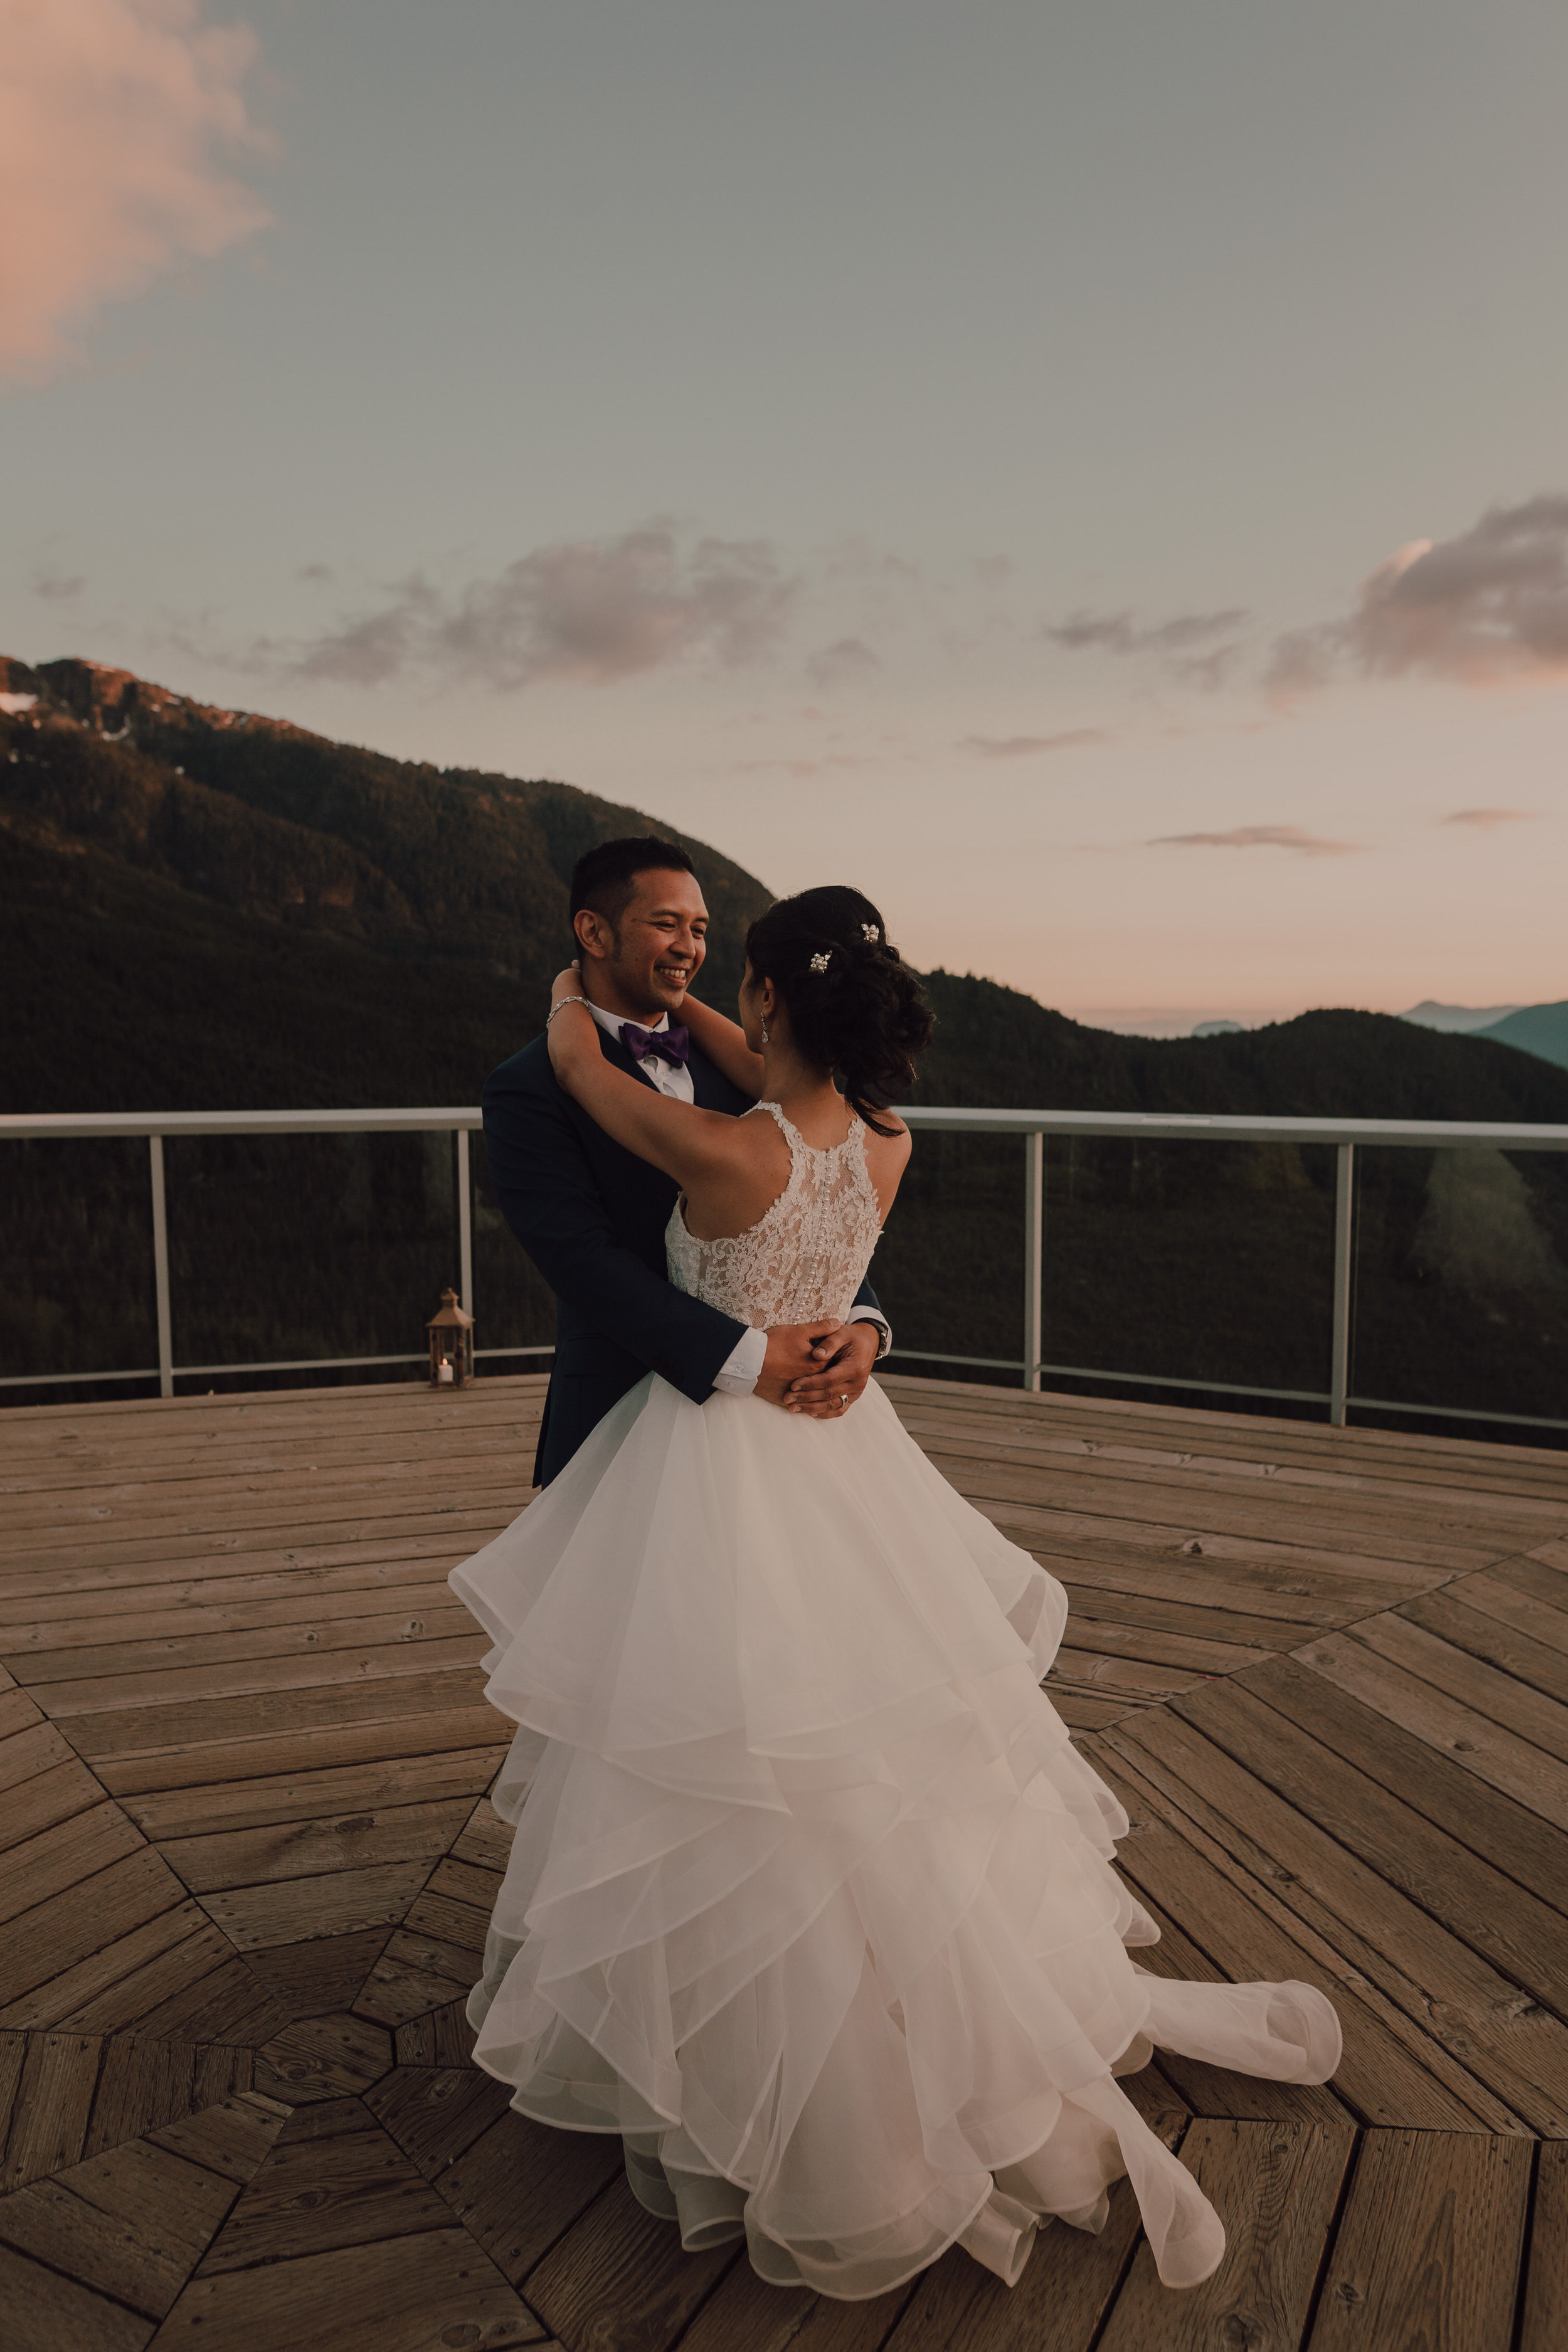 Squamish Wedding Photographer - Sea to Sky Gondola Wedding Photos -  Vancouver Wedding Photographer & Videographer - Sunshine Coast Wedding Photos - Sunshine Coast Wedding Photographer - Jennifer Picard Photography - IMG_5433.jpg